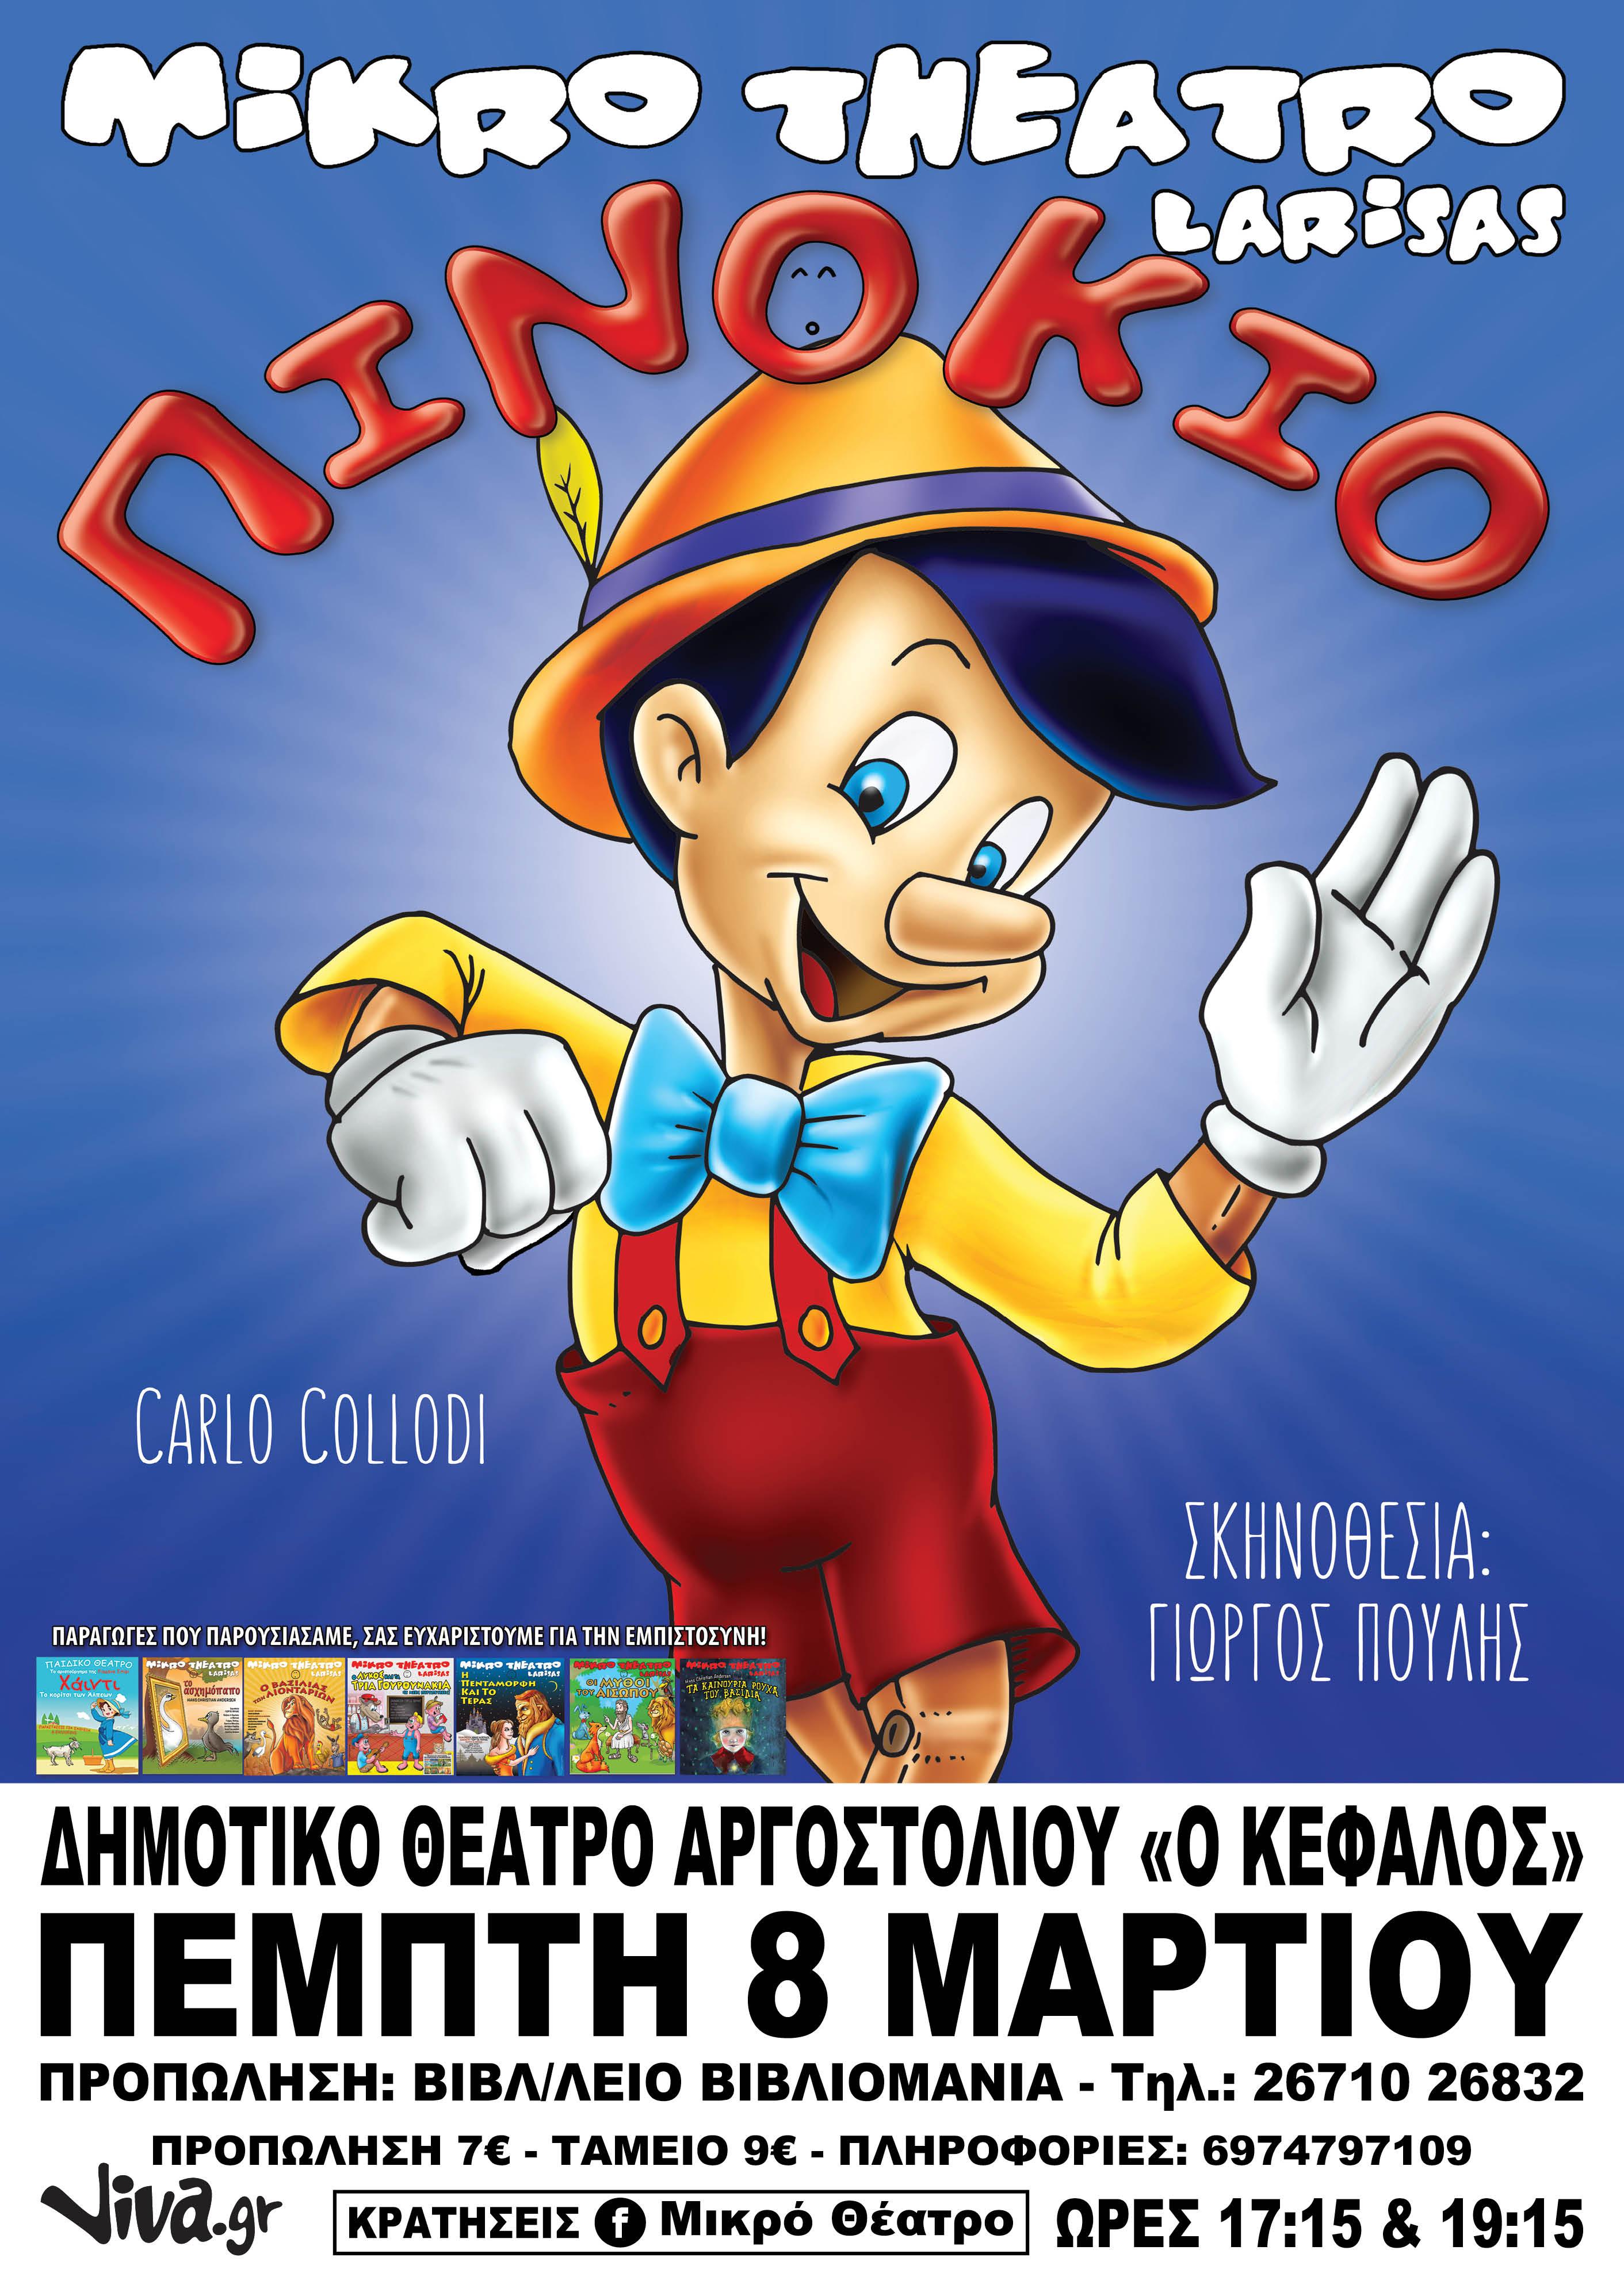 47.8×67.6poster PinocchioARGOSTOLI